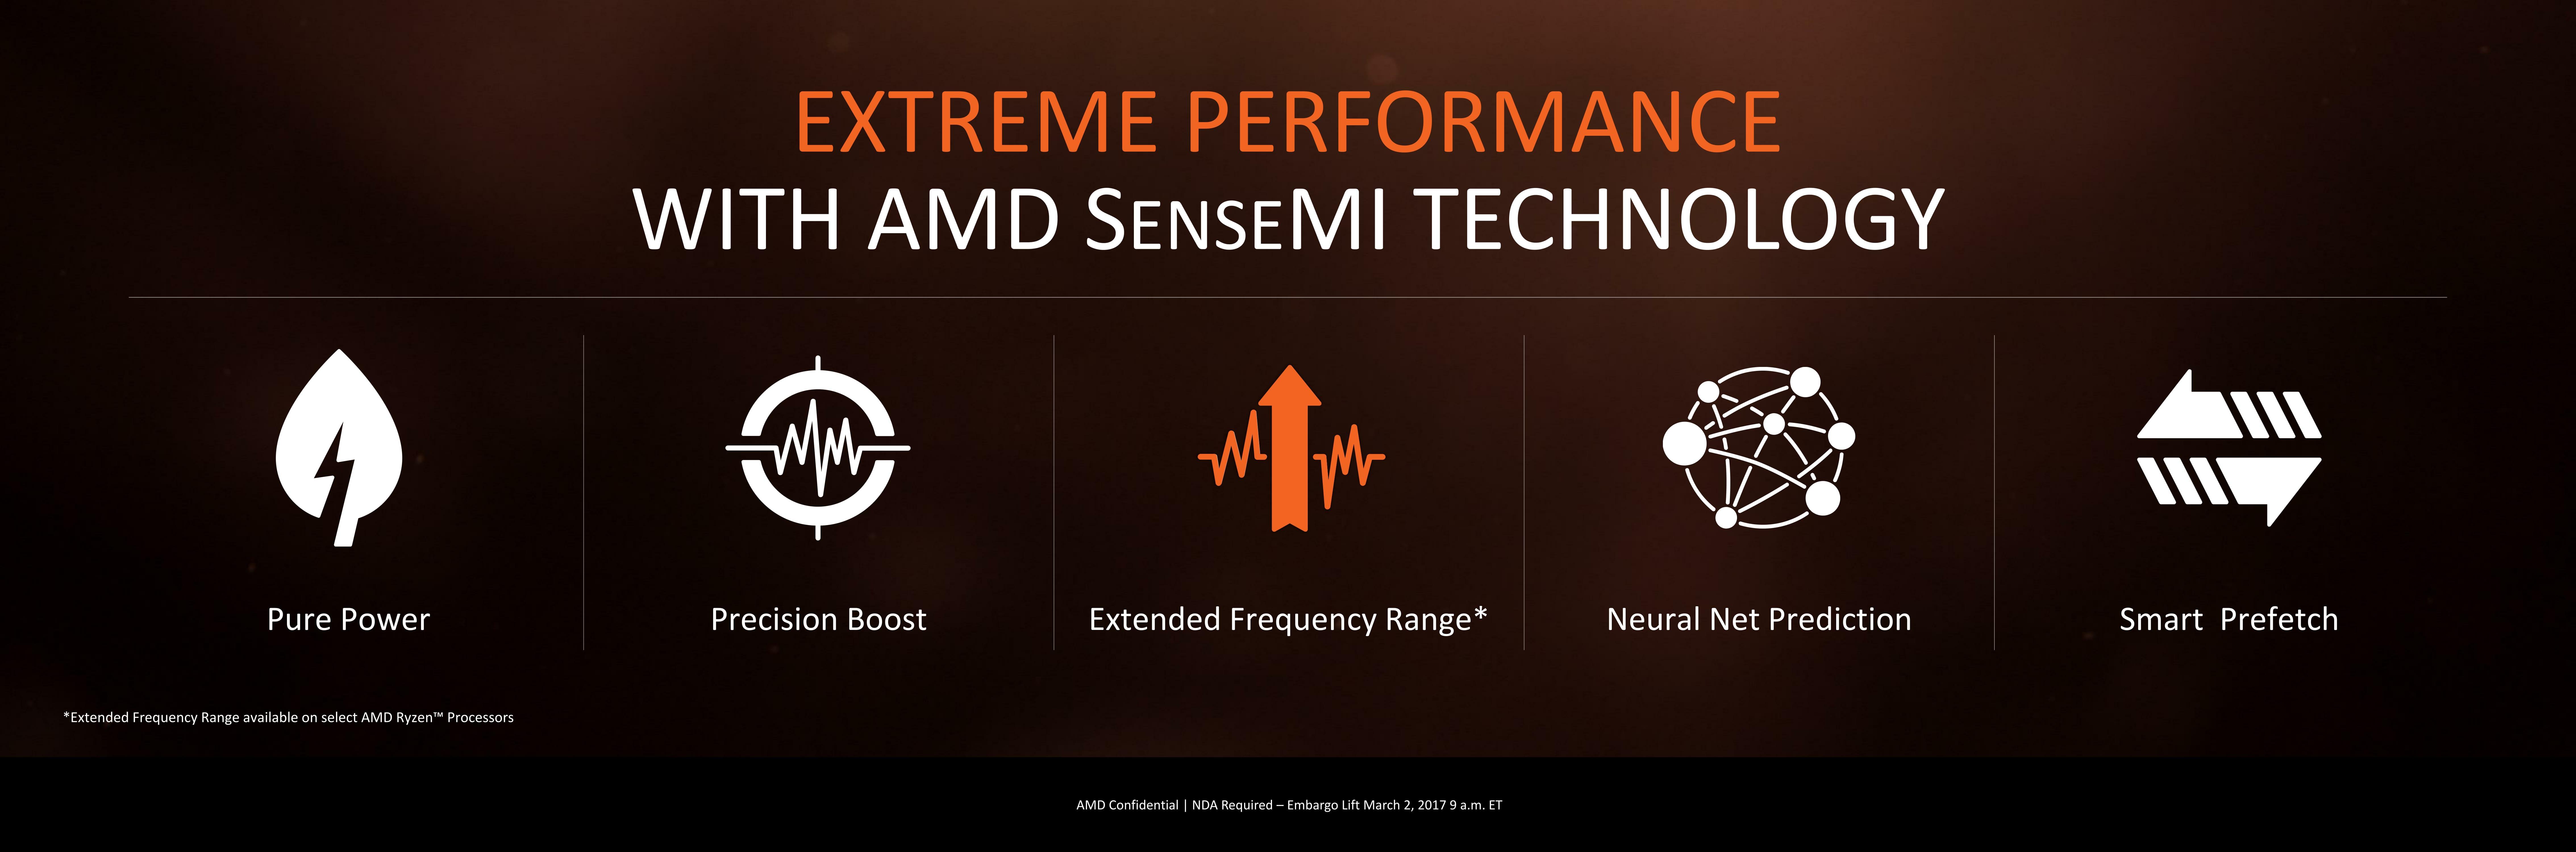 Power, Performance, and Pre-Fetch: AMD SenseMI - The AMD Zen